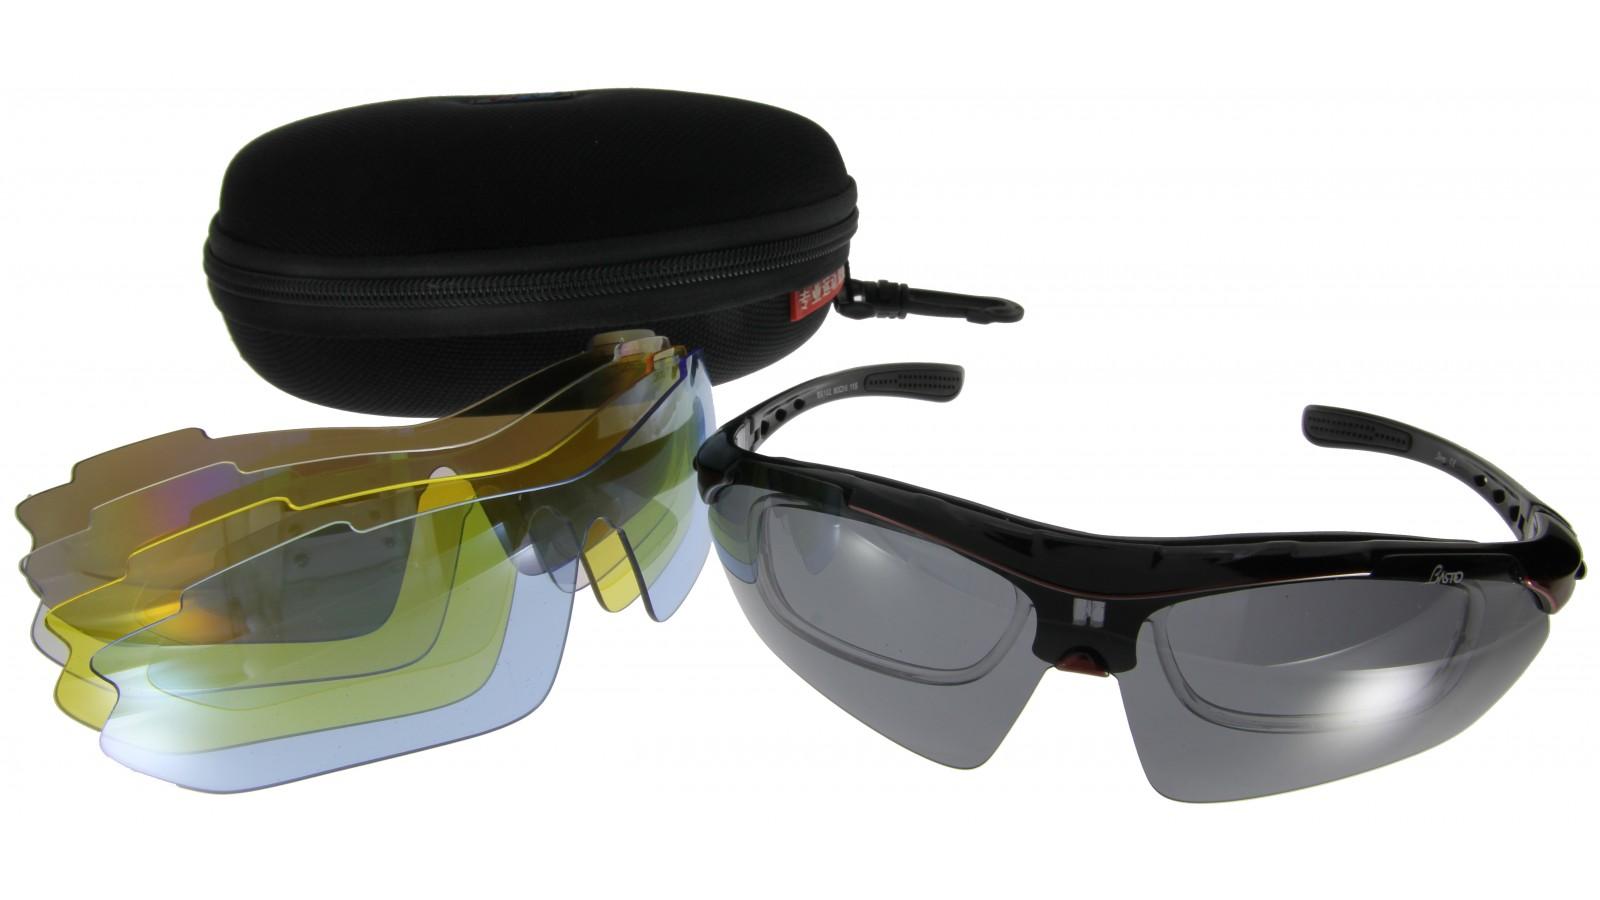 radbrille mit sehst rke optische radbrille mit 5. Black Bedroom Furniture Sets. Home Design Ideas